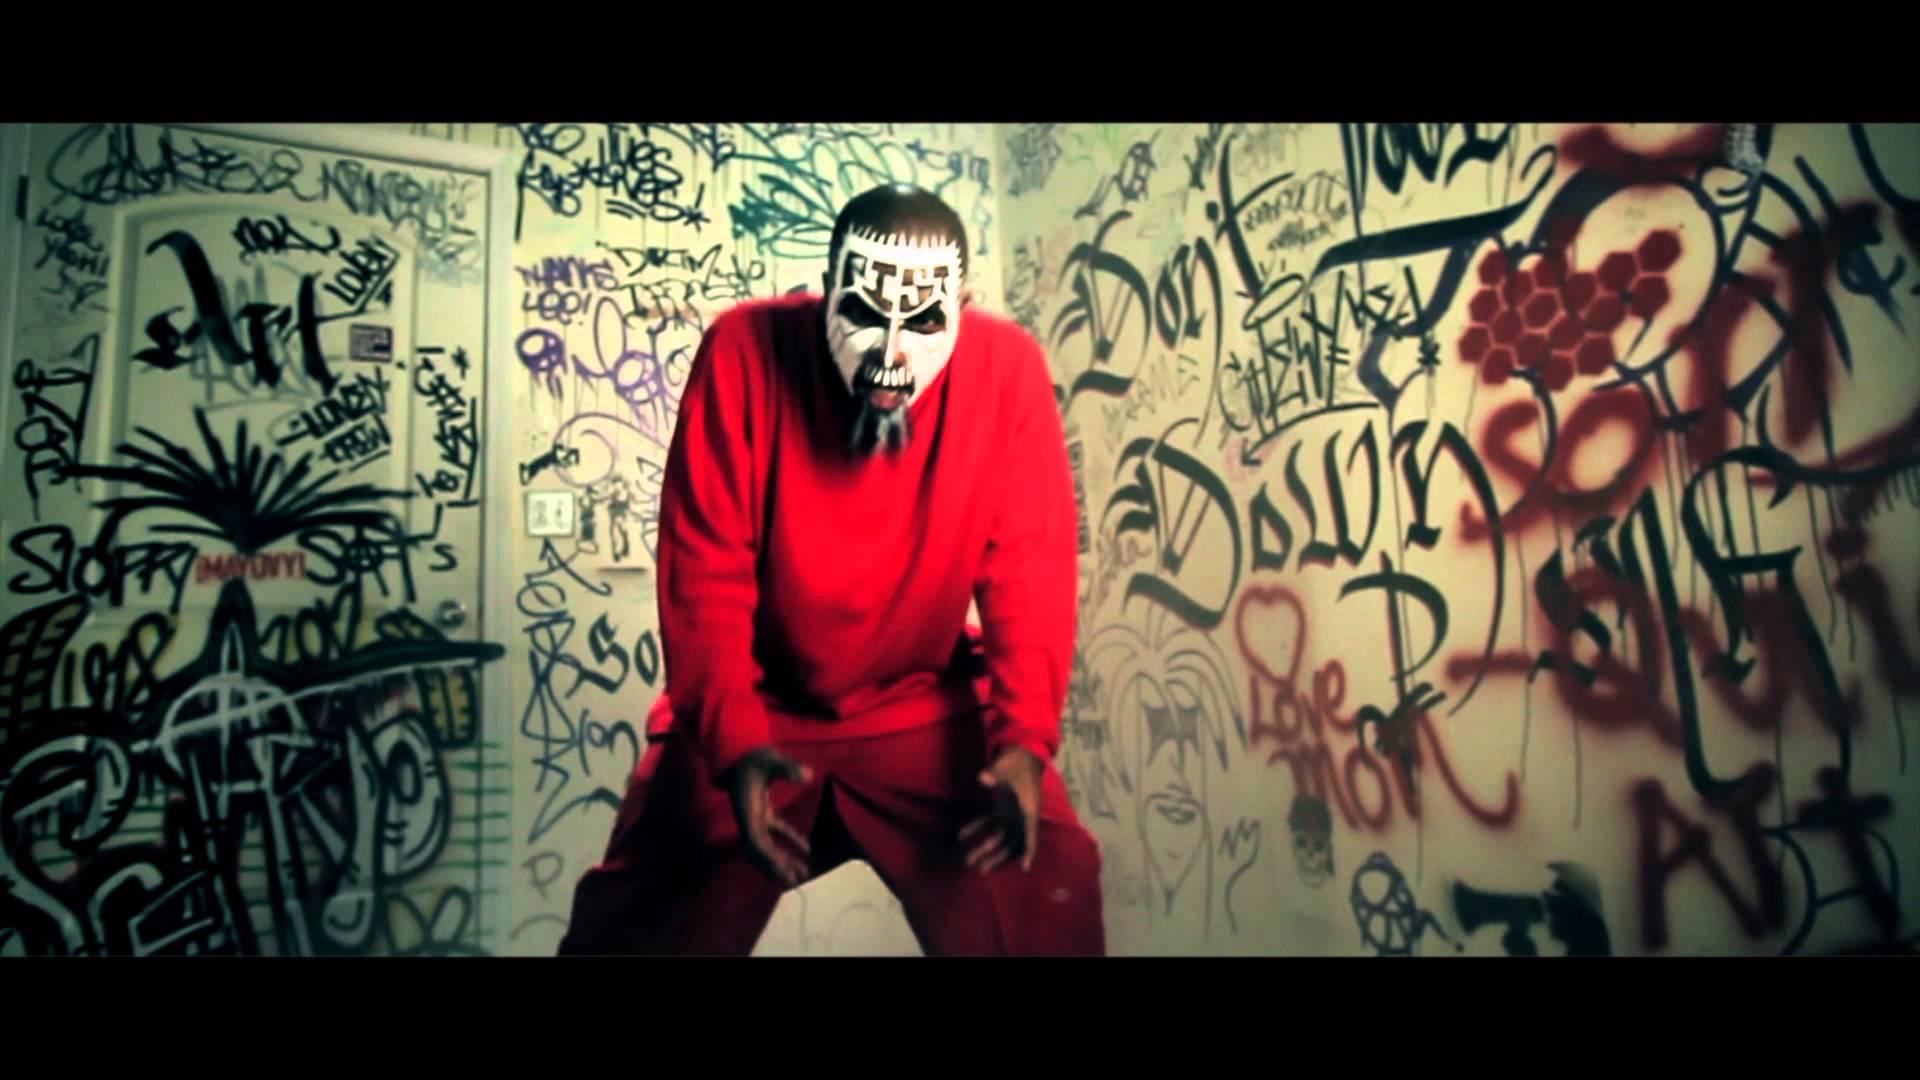 TECH N9NE gangsta rapper rap hip hop snoop snoop dog f wallpaper 1920x1080